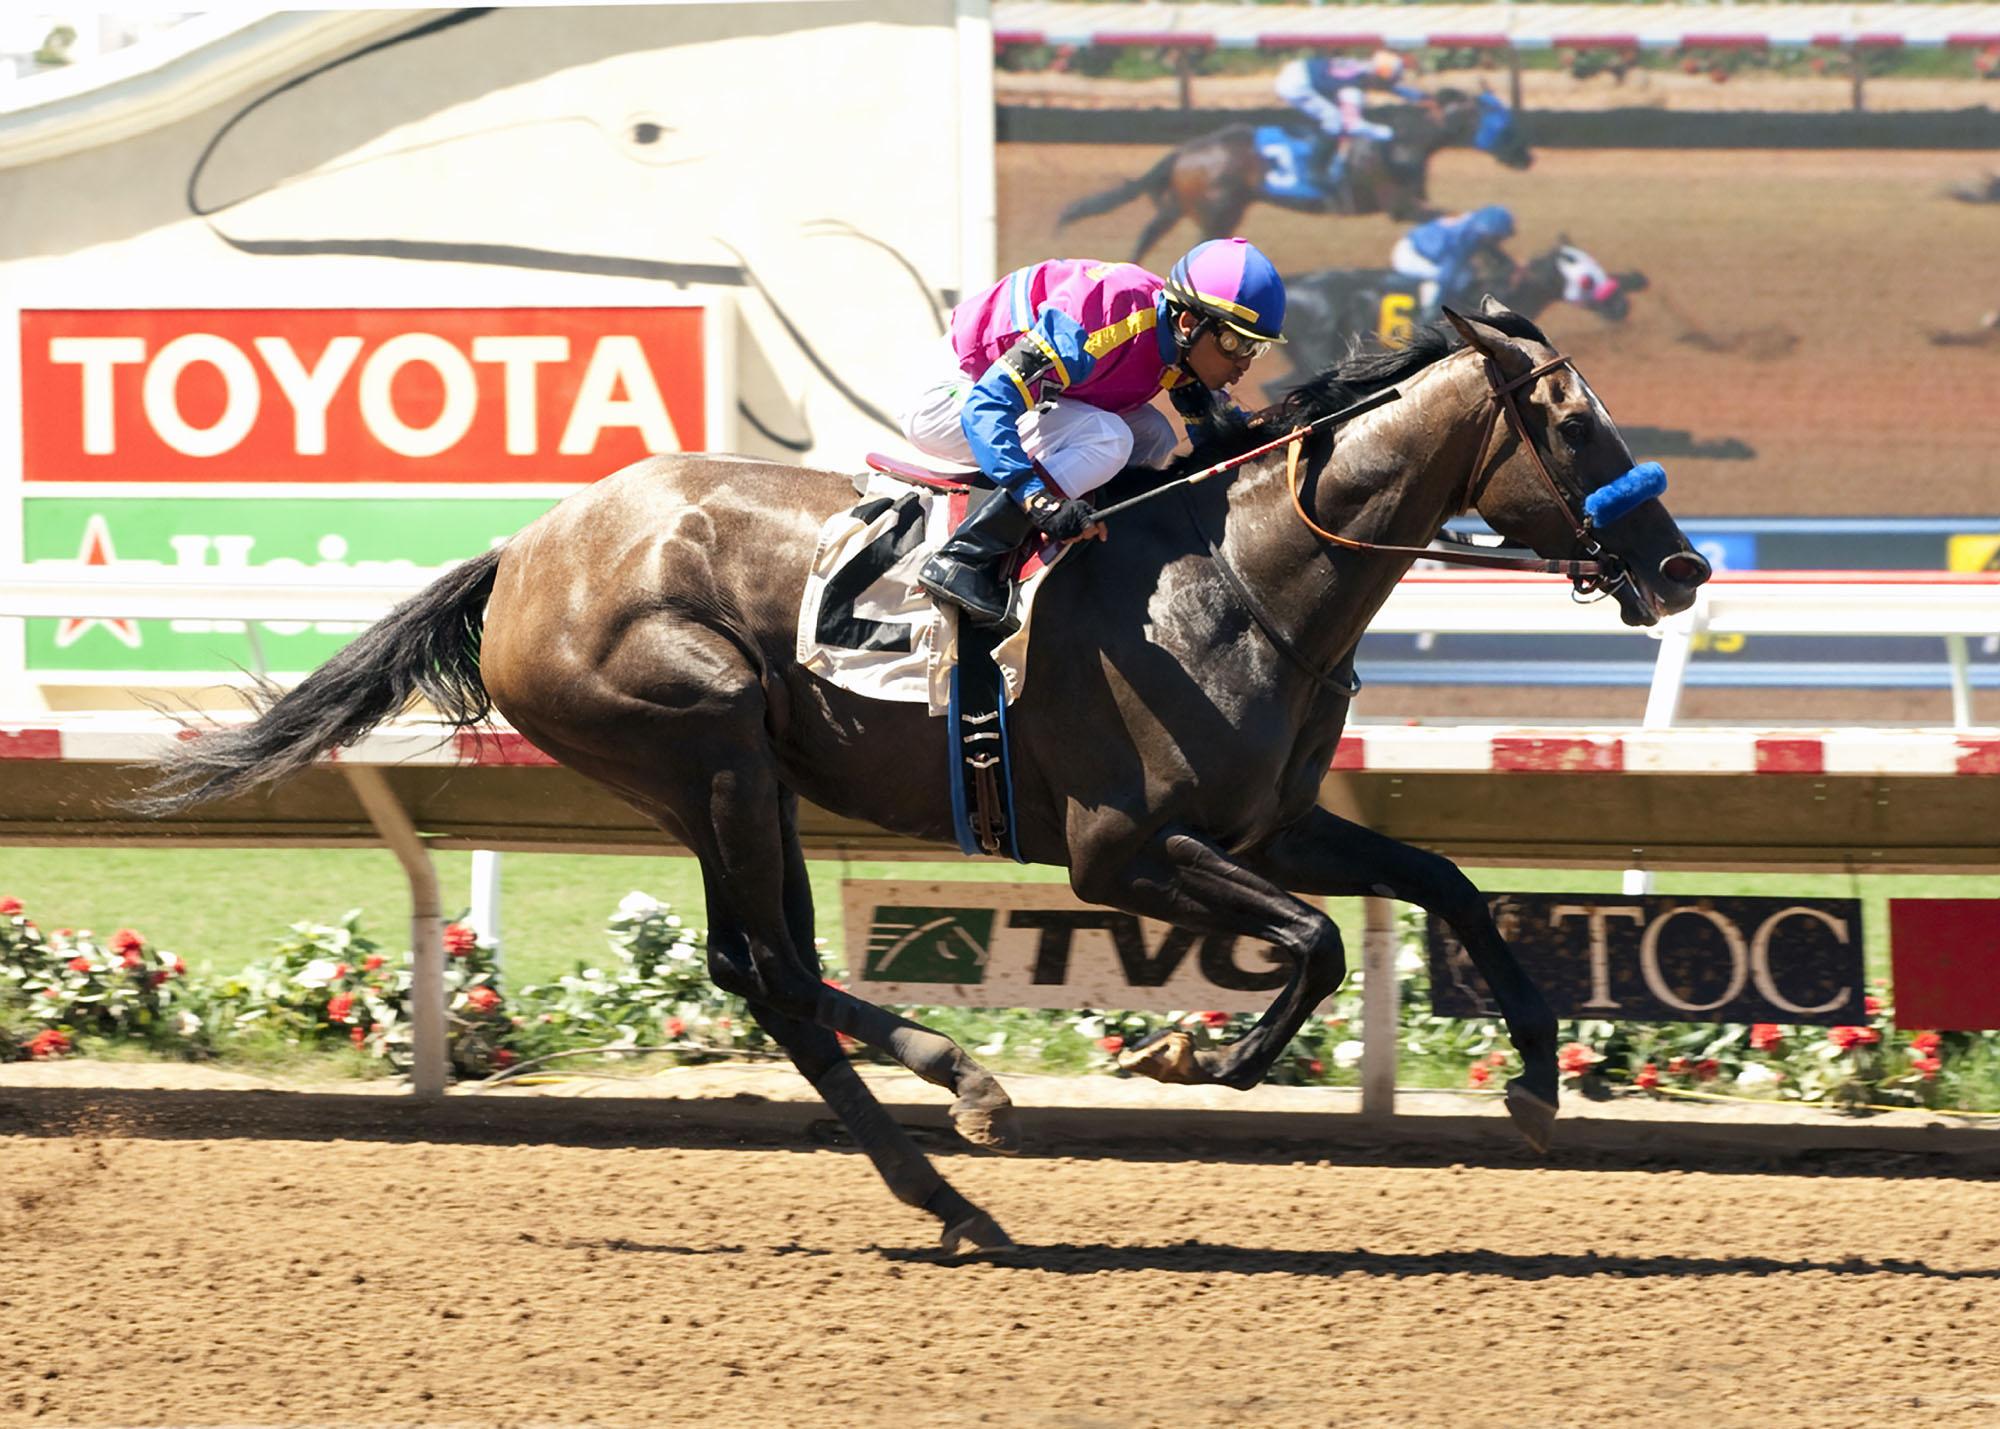 George Krikorian's Big Book and jockey Rafael Bejarano win the $200,000 Fleet Treat Stakes Saturday, July 25, 2015 at Del Mar Race Track in Del Mar, Calif. (Benoit Photo via AP)